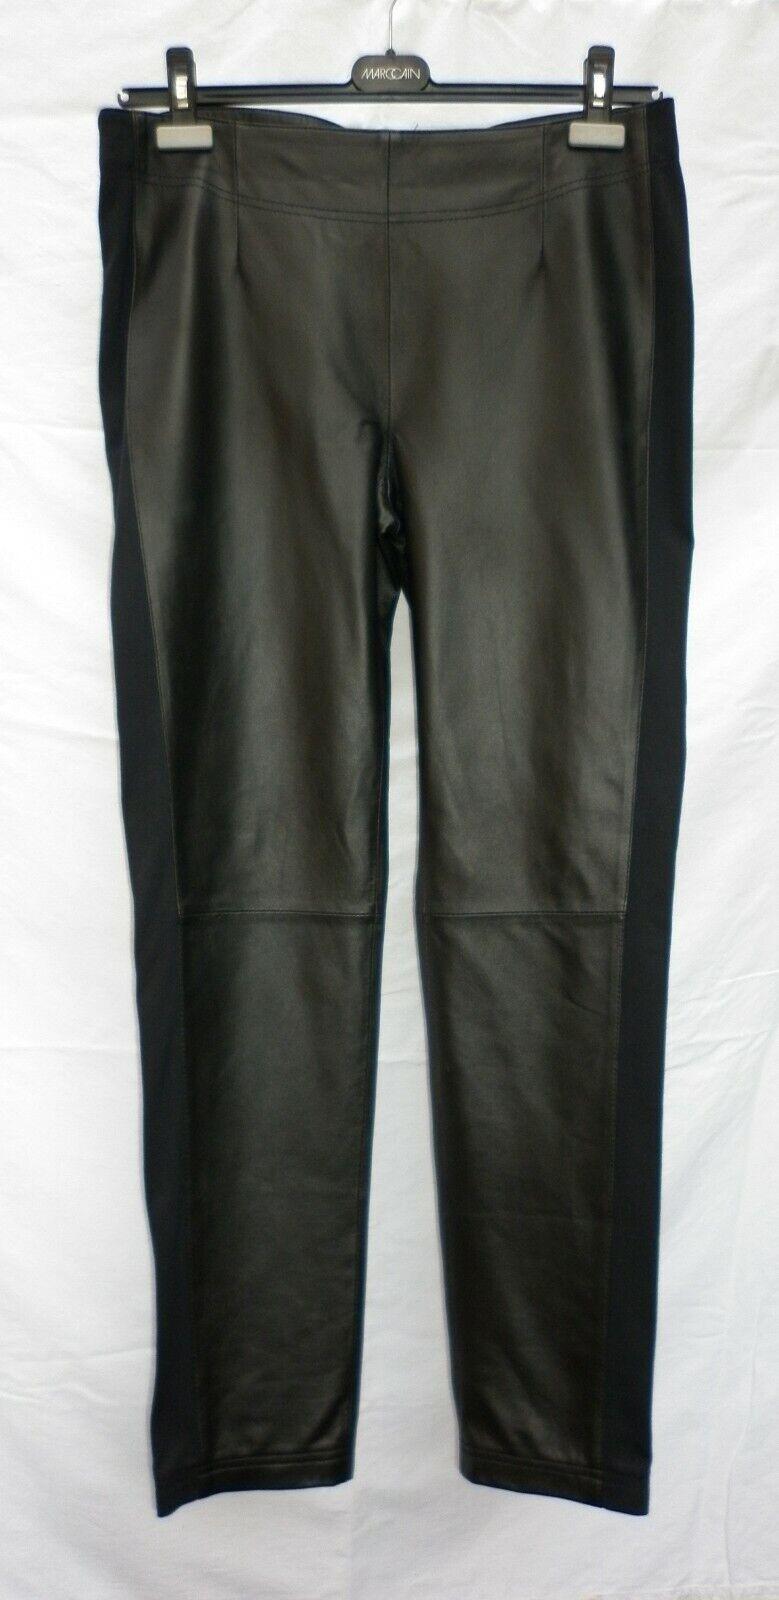 c3d4e1b188b40f Lederhose schwarz schwarz schwarz RICK CARDONA HEINE Leder Hose  Lederleggings HINGUCKER 1a0b2e